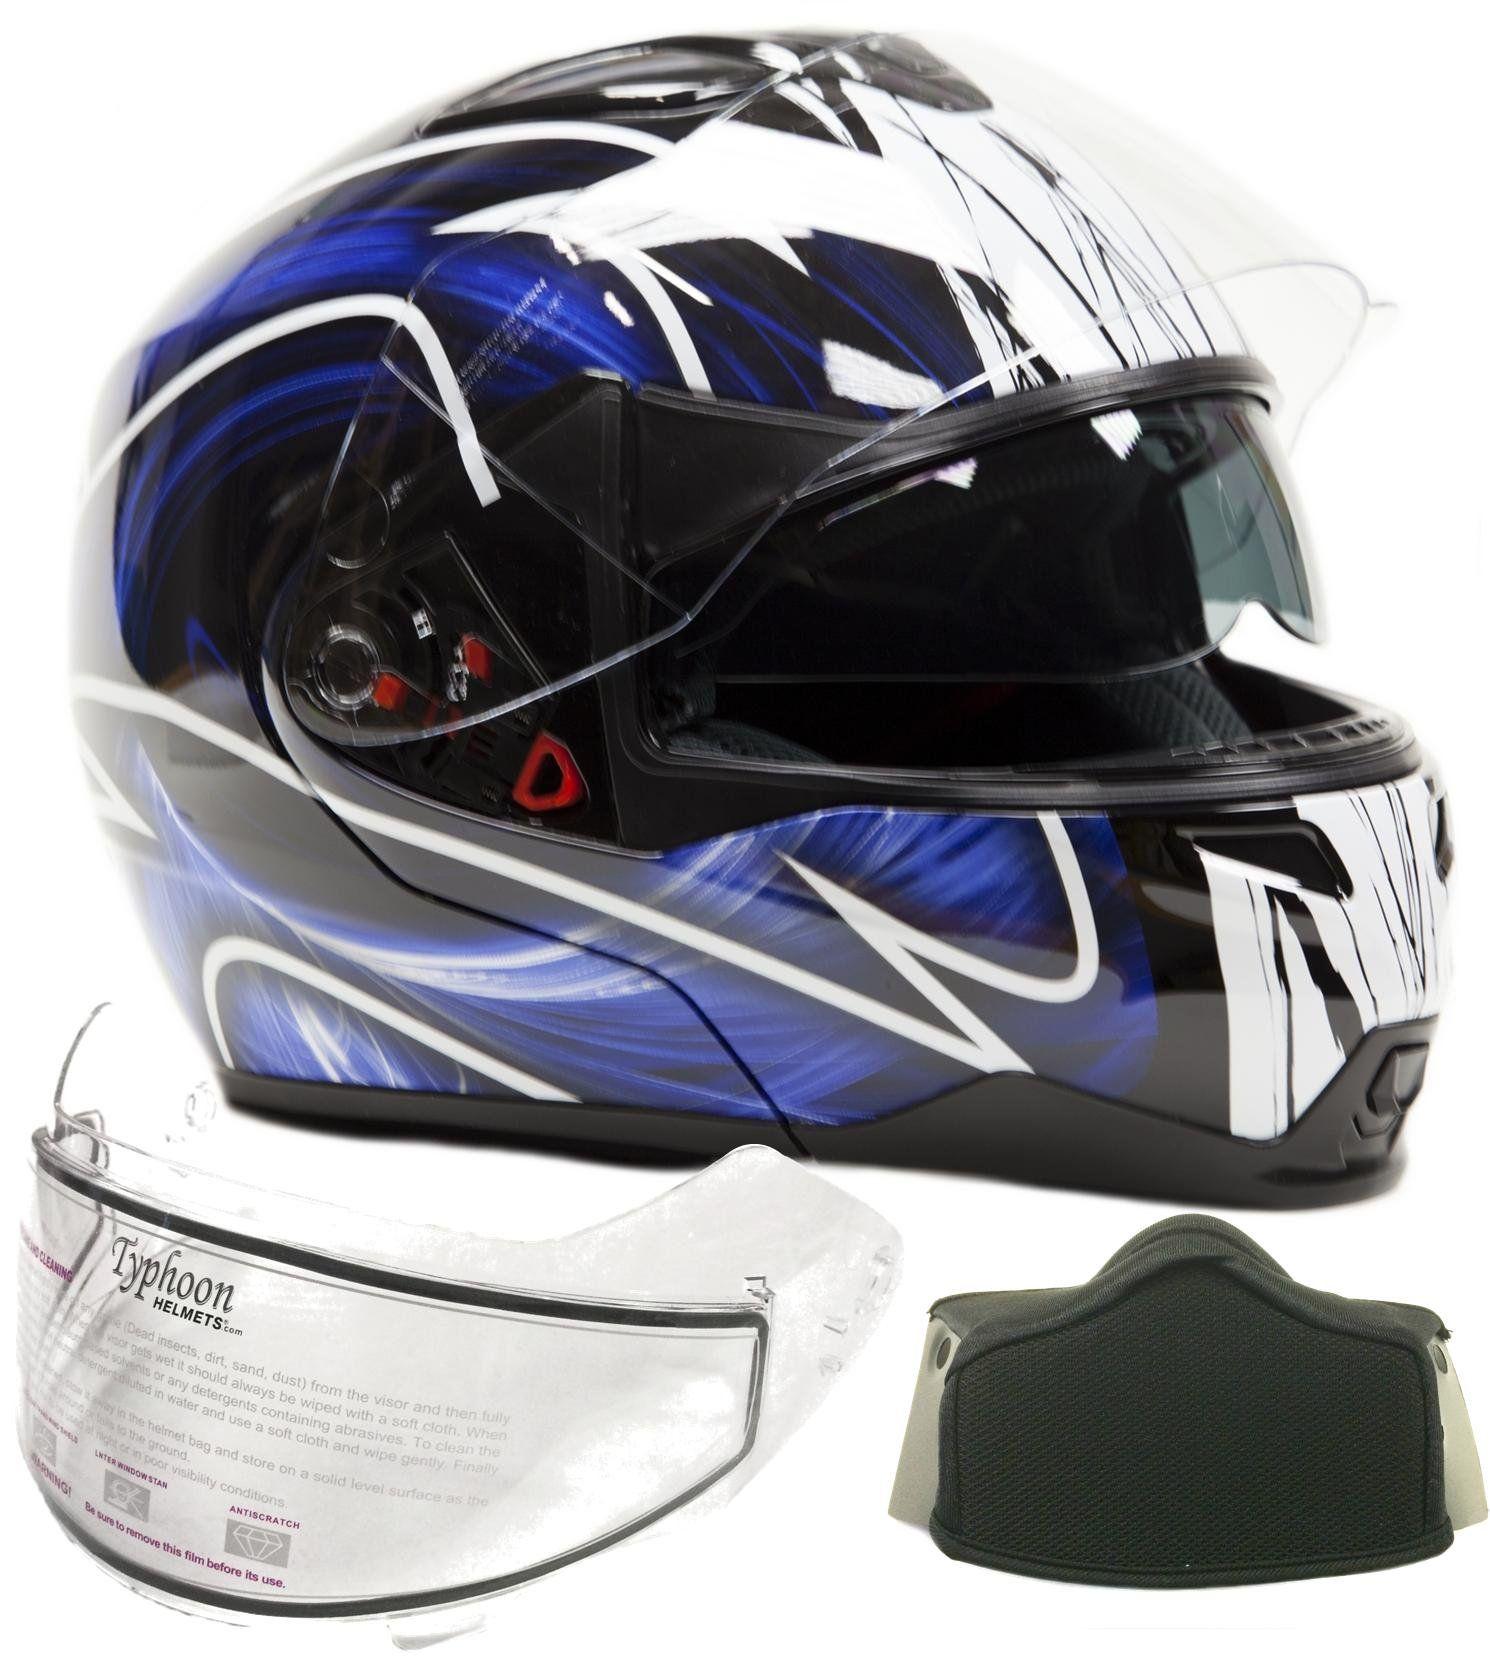 Dual Visor Modular Flip Up Snowmobile Helmet Black Blue Xl Retractable Tinted Sun Visor Smooth Opening And Closi Snowmobile Helmets Helmet Snowmobile